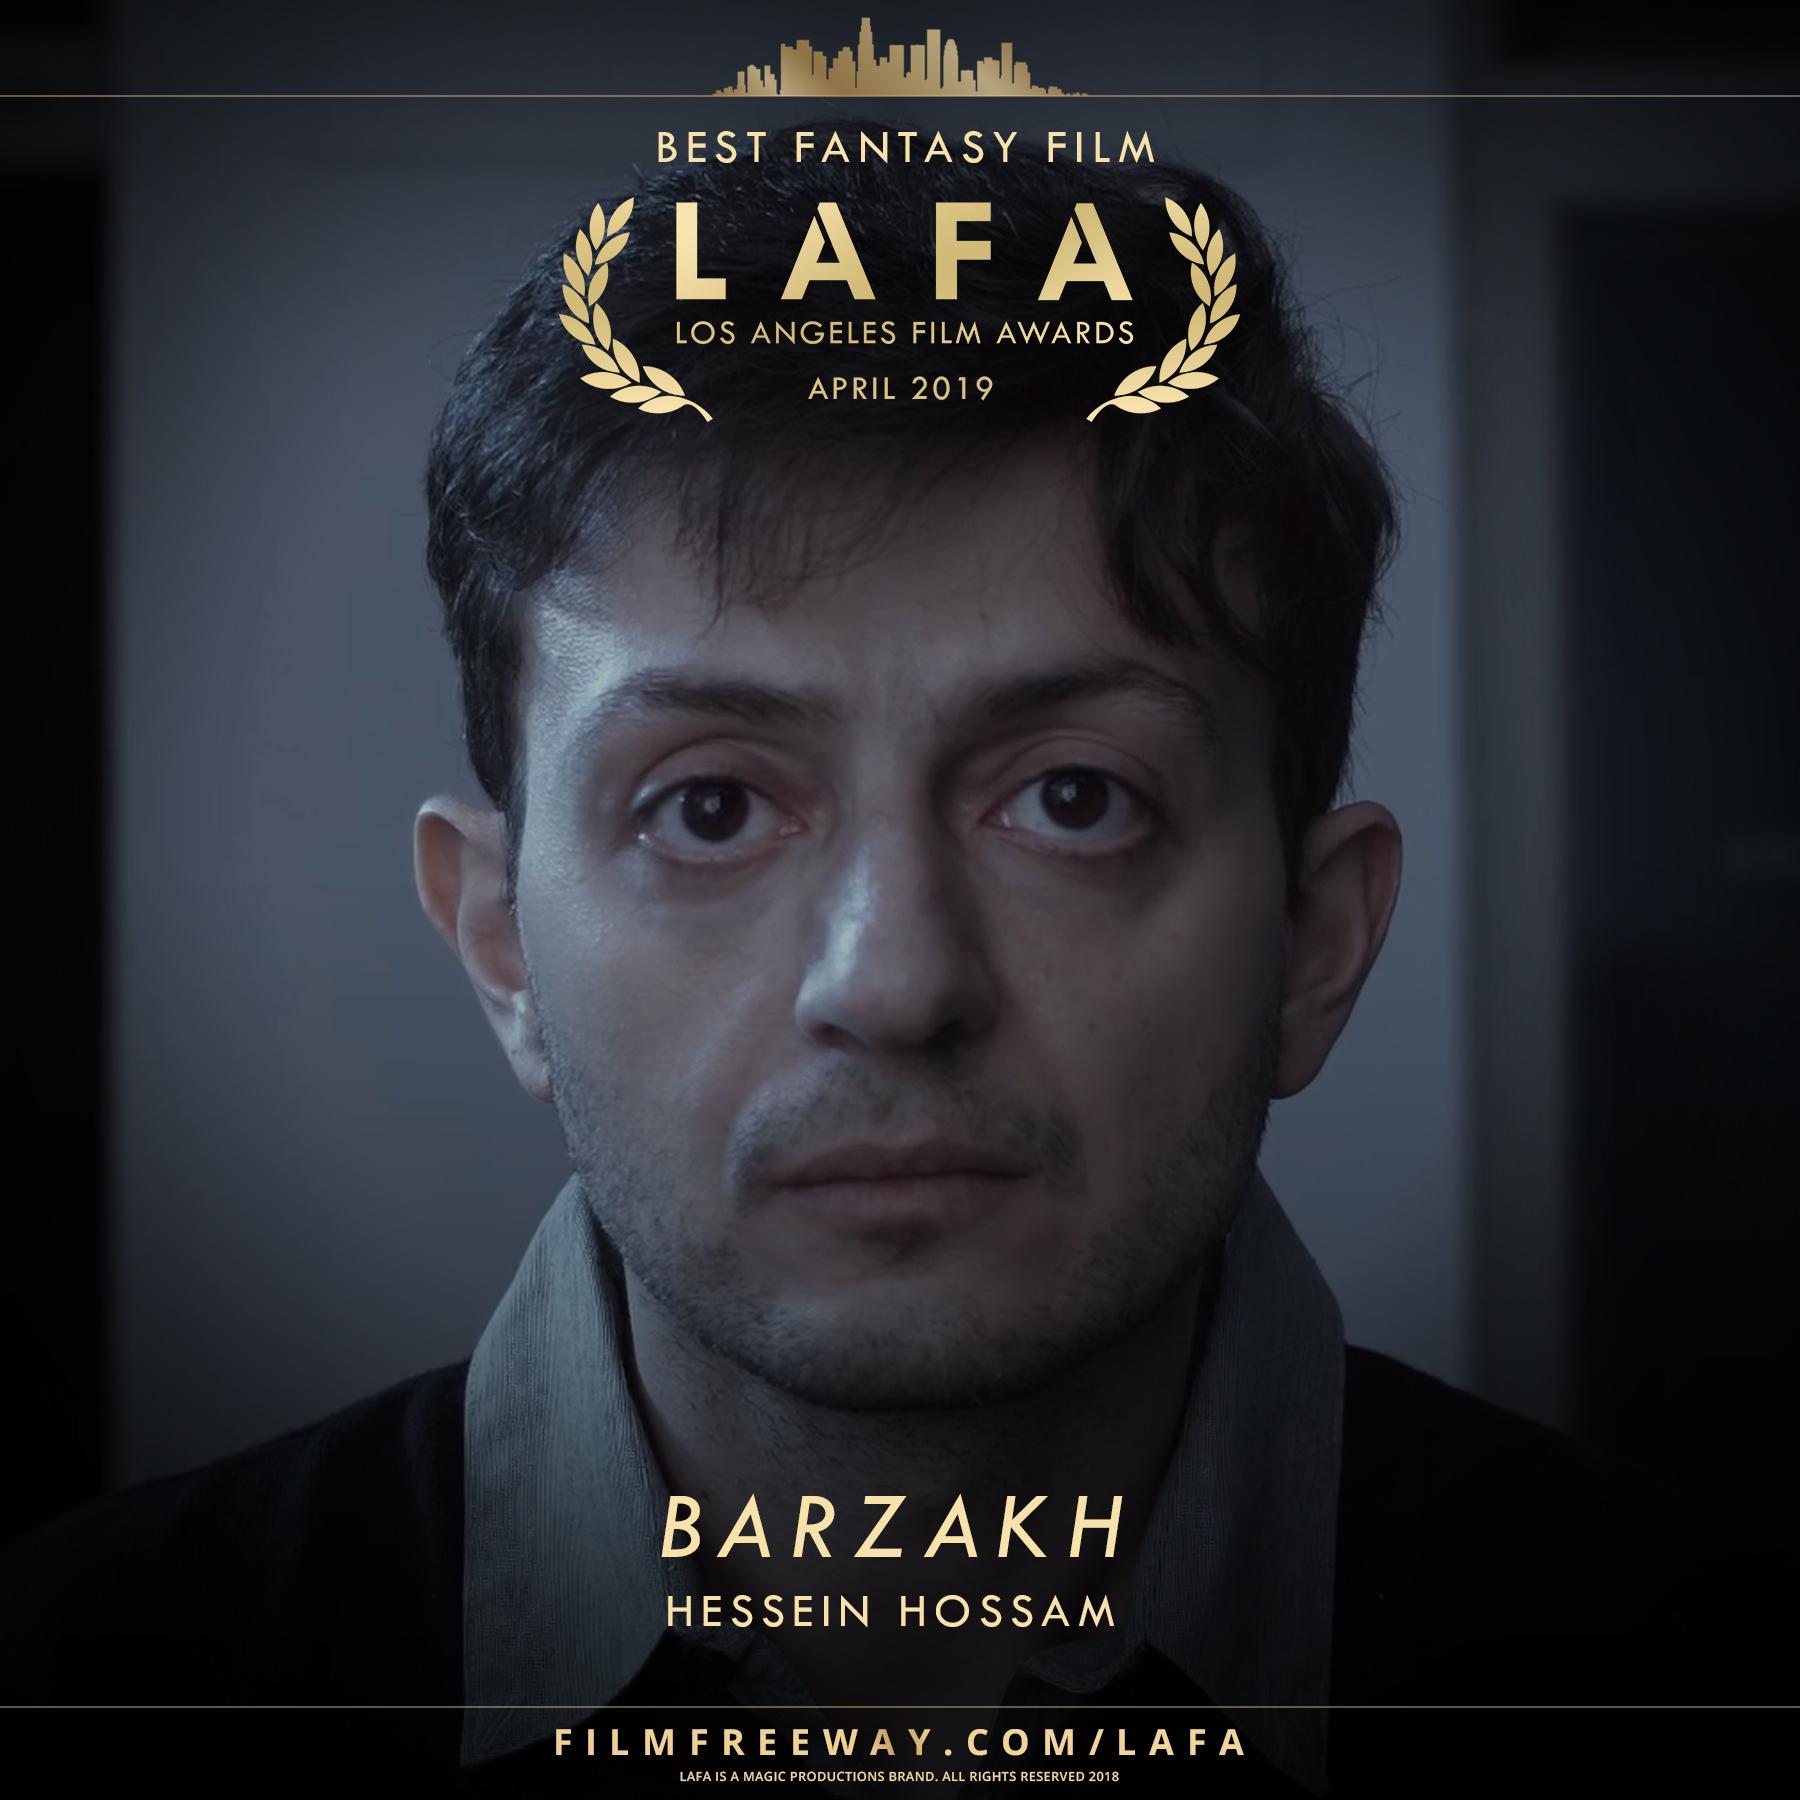 BARZAKH design